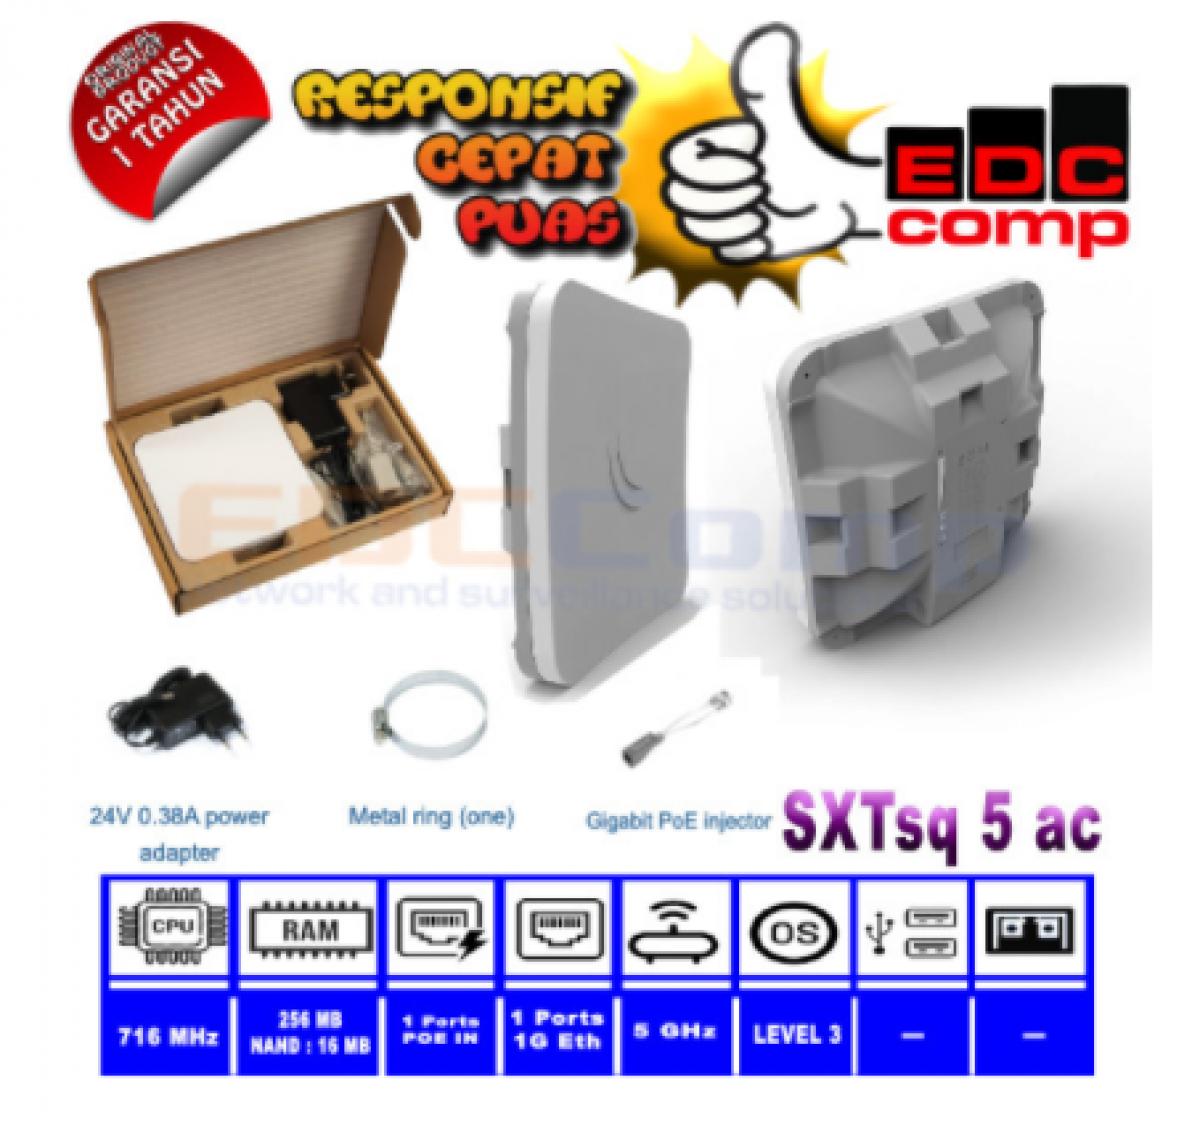 Mikrotik SXTsqG 5acD Embedded Wireless Client RbSXTsqG 5acD 5GHz - EdcComp